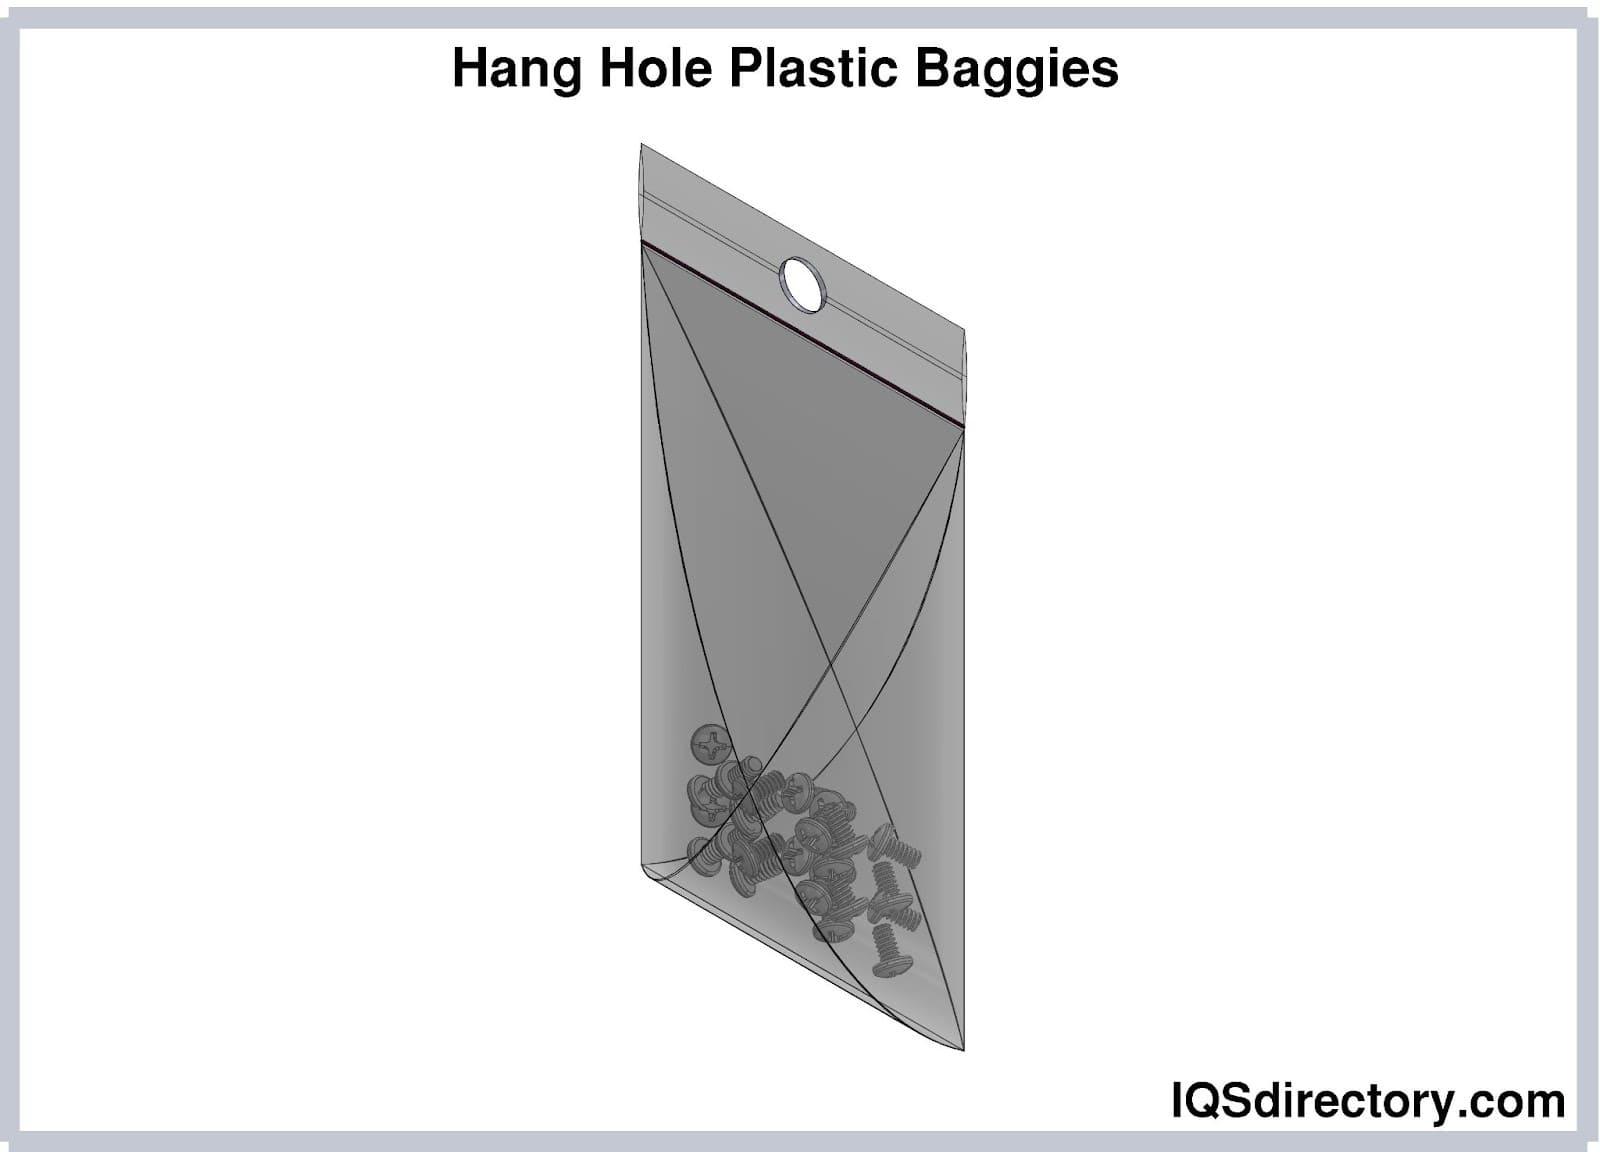 Hang Hole Plastic Baggies